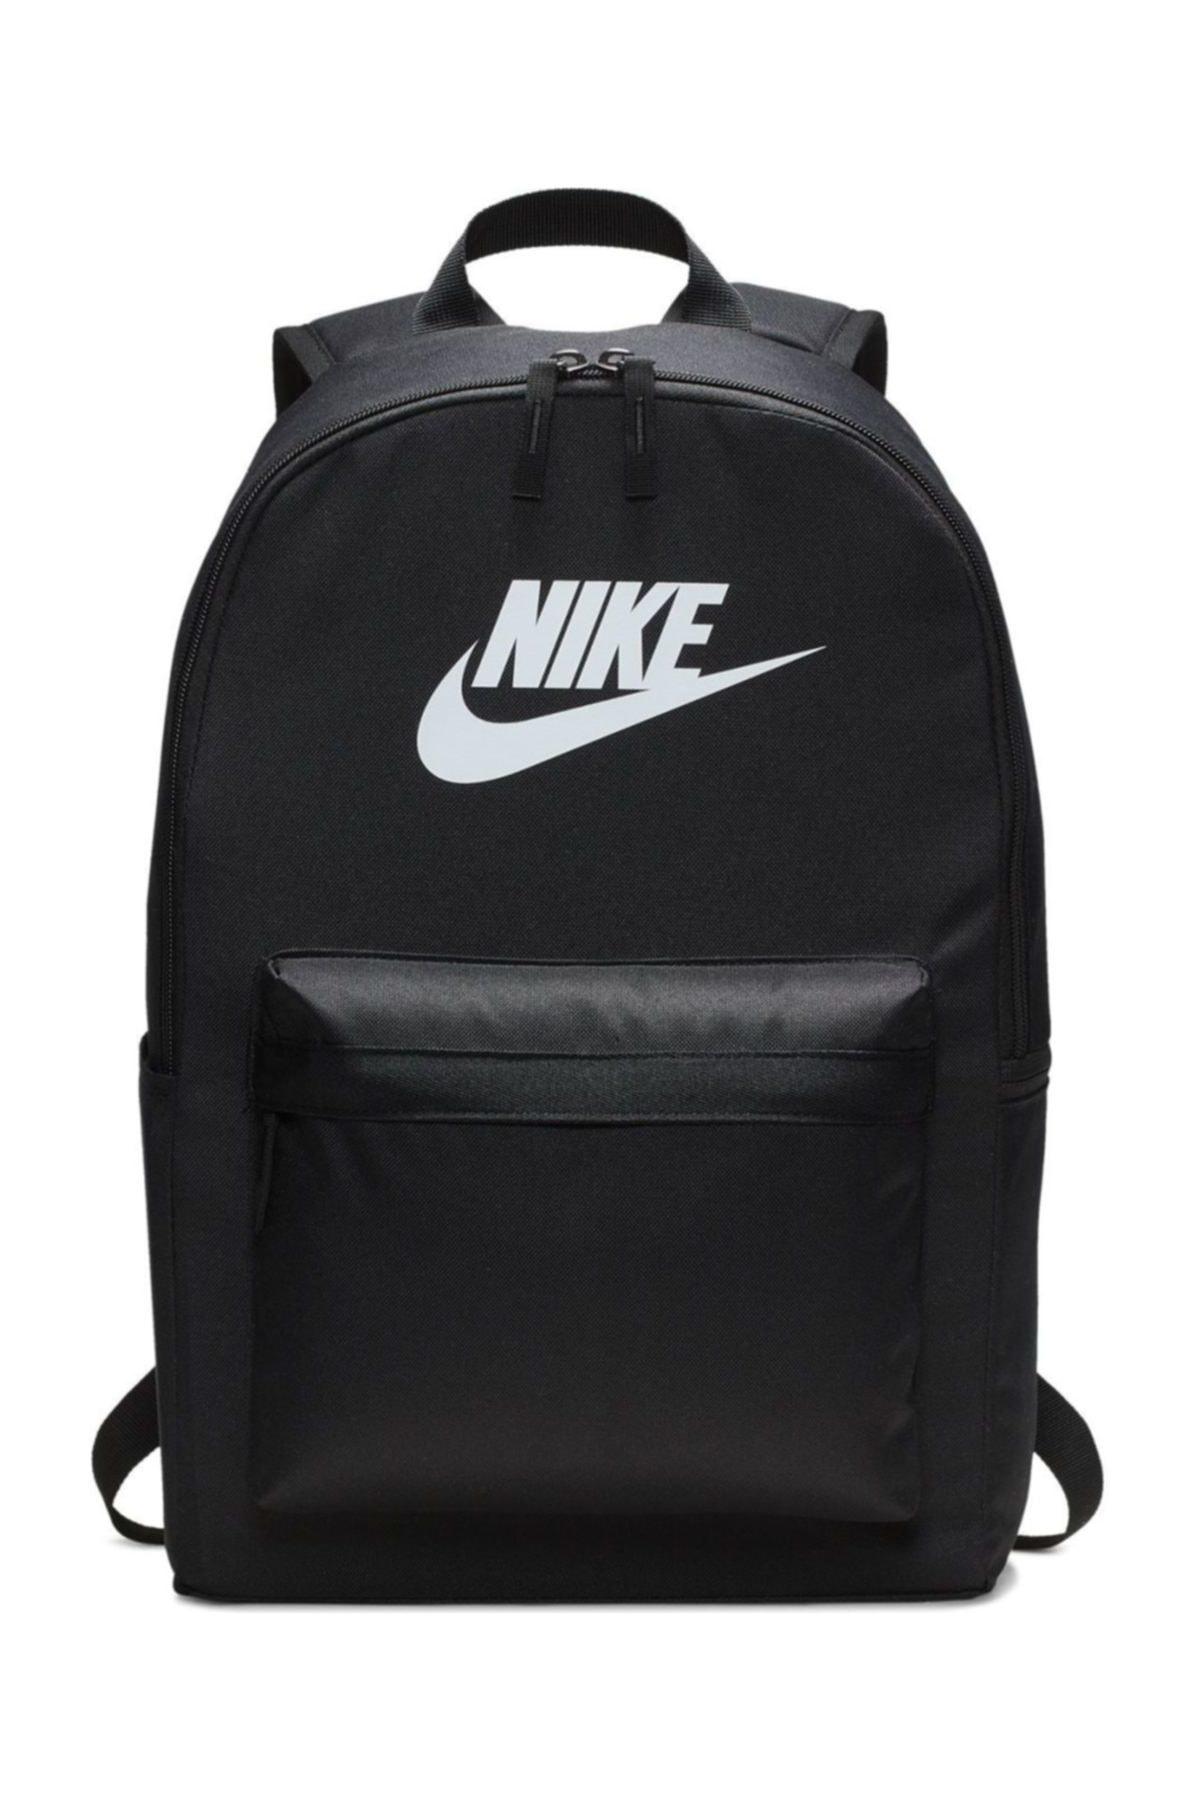 خرید اینترنتی کوله پشتی خاص برند Nike اورجینال رنگ مشکی کد ty34739215